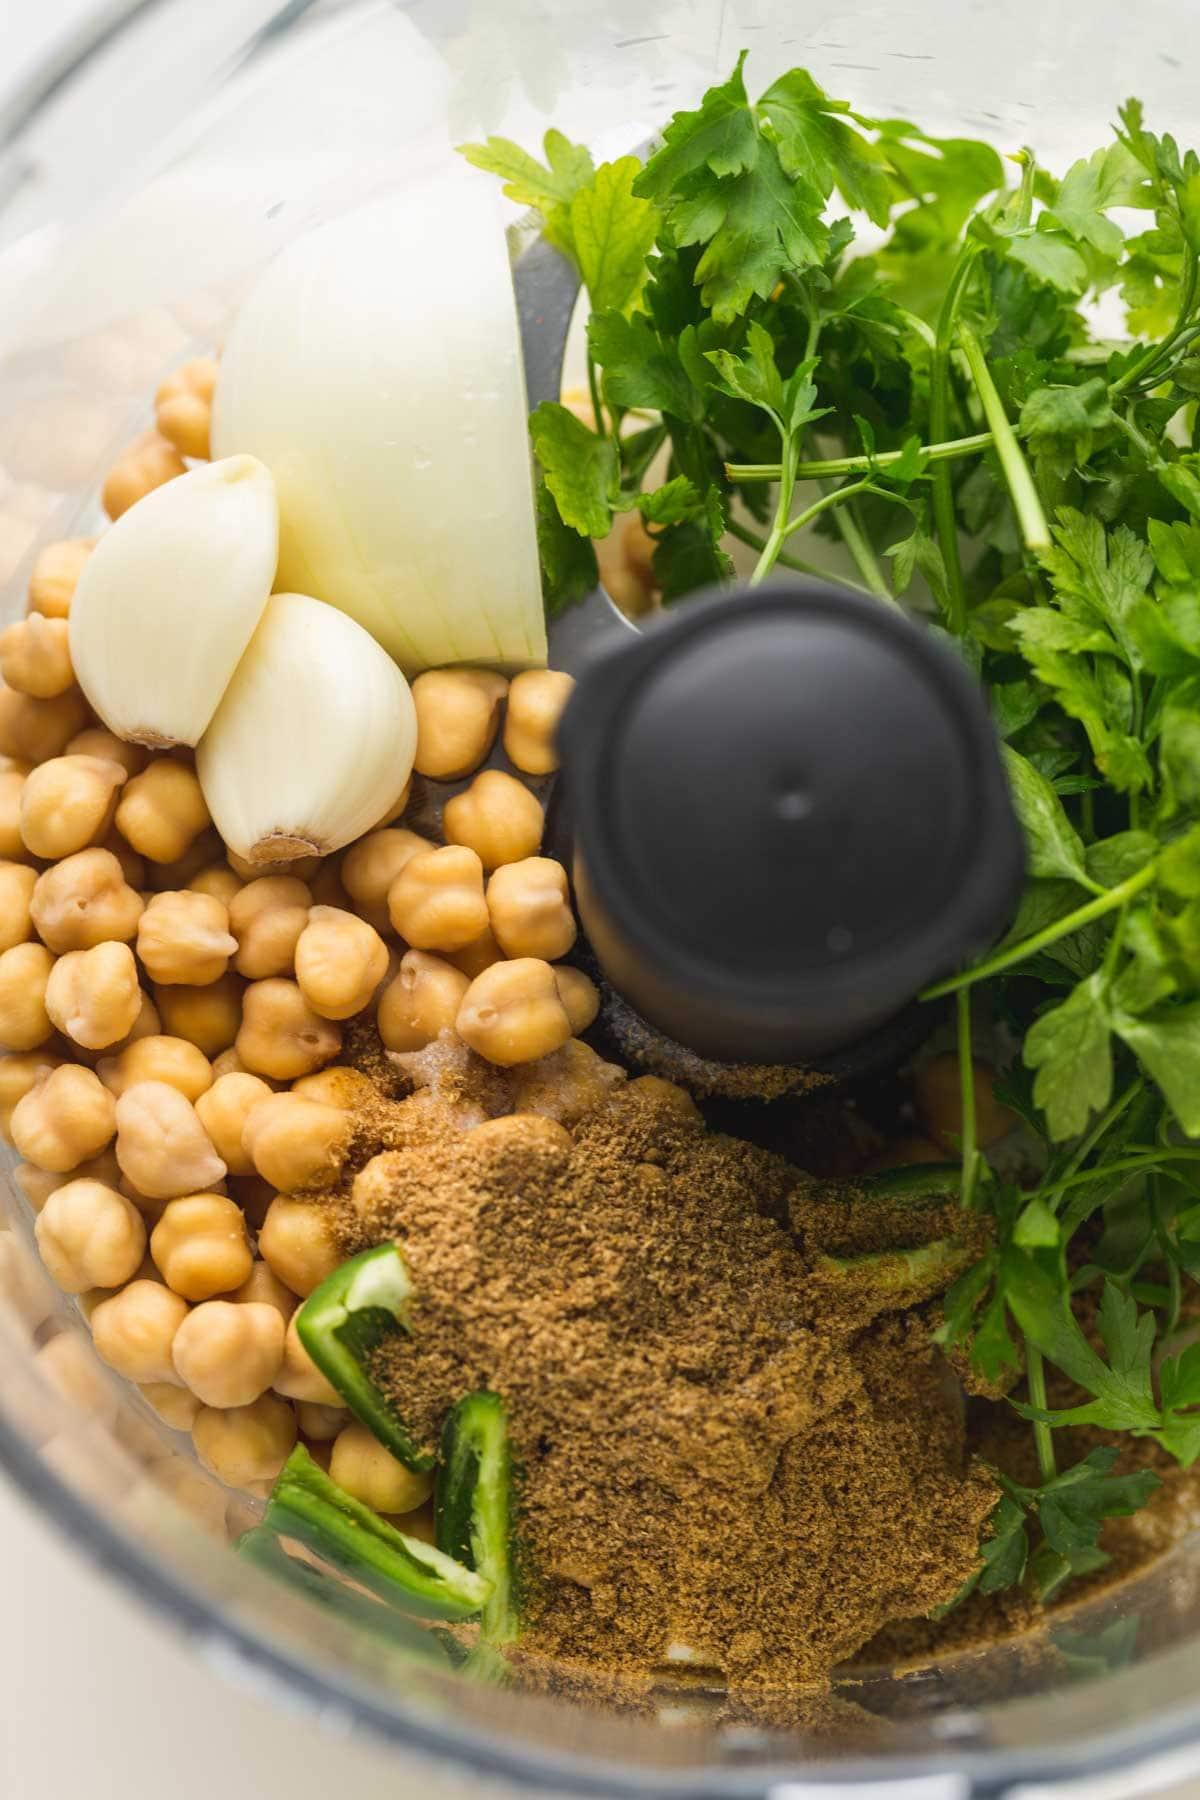 Falafel ingredients in a food processor